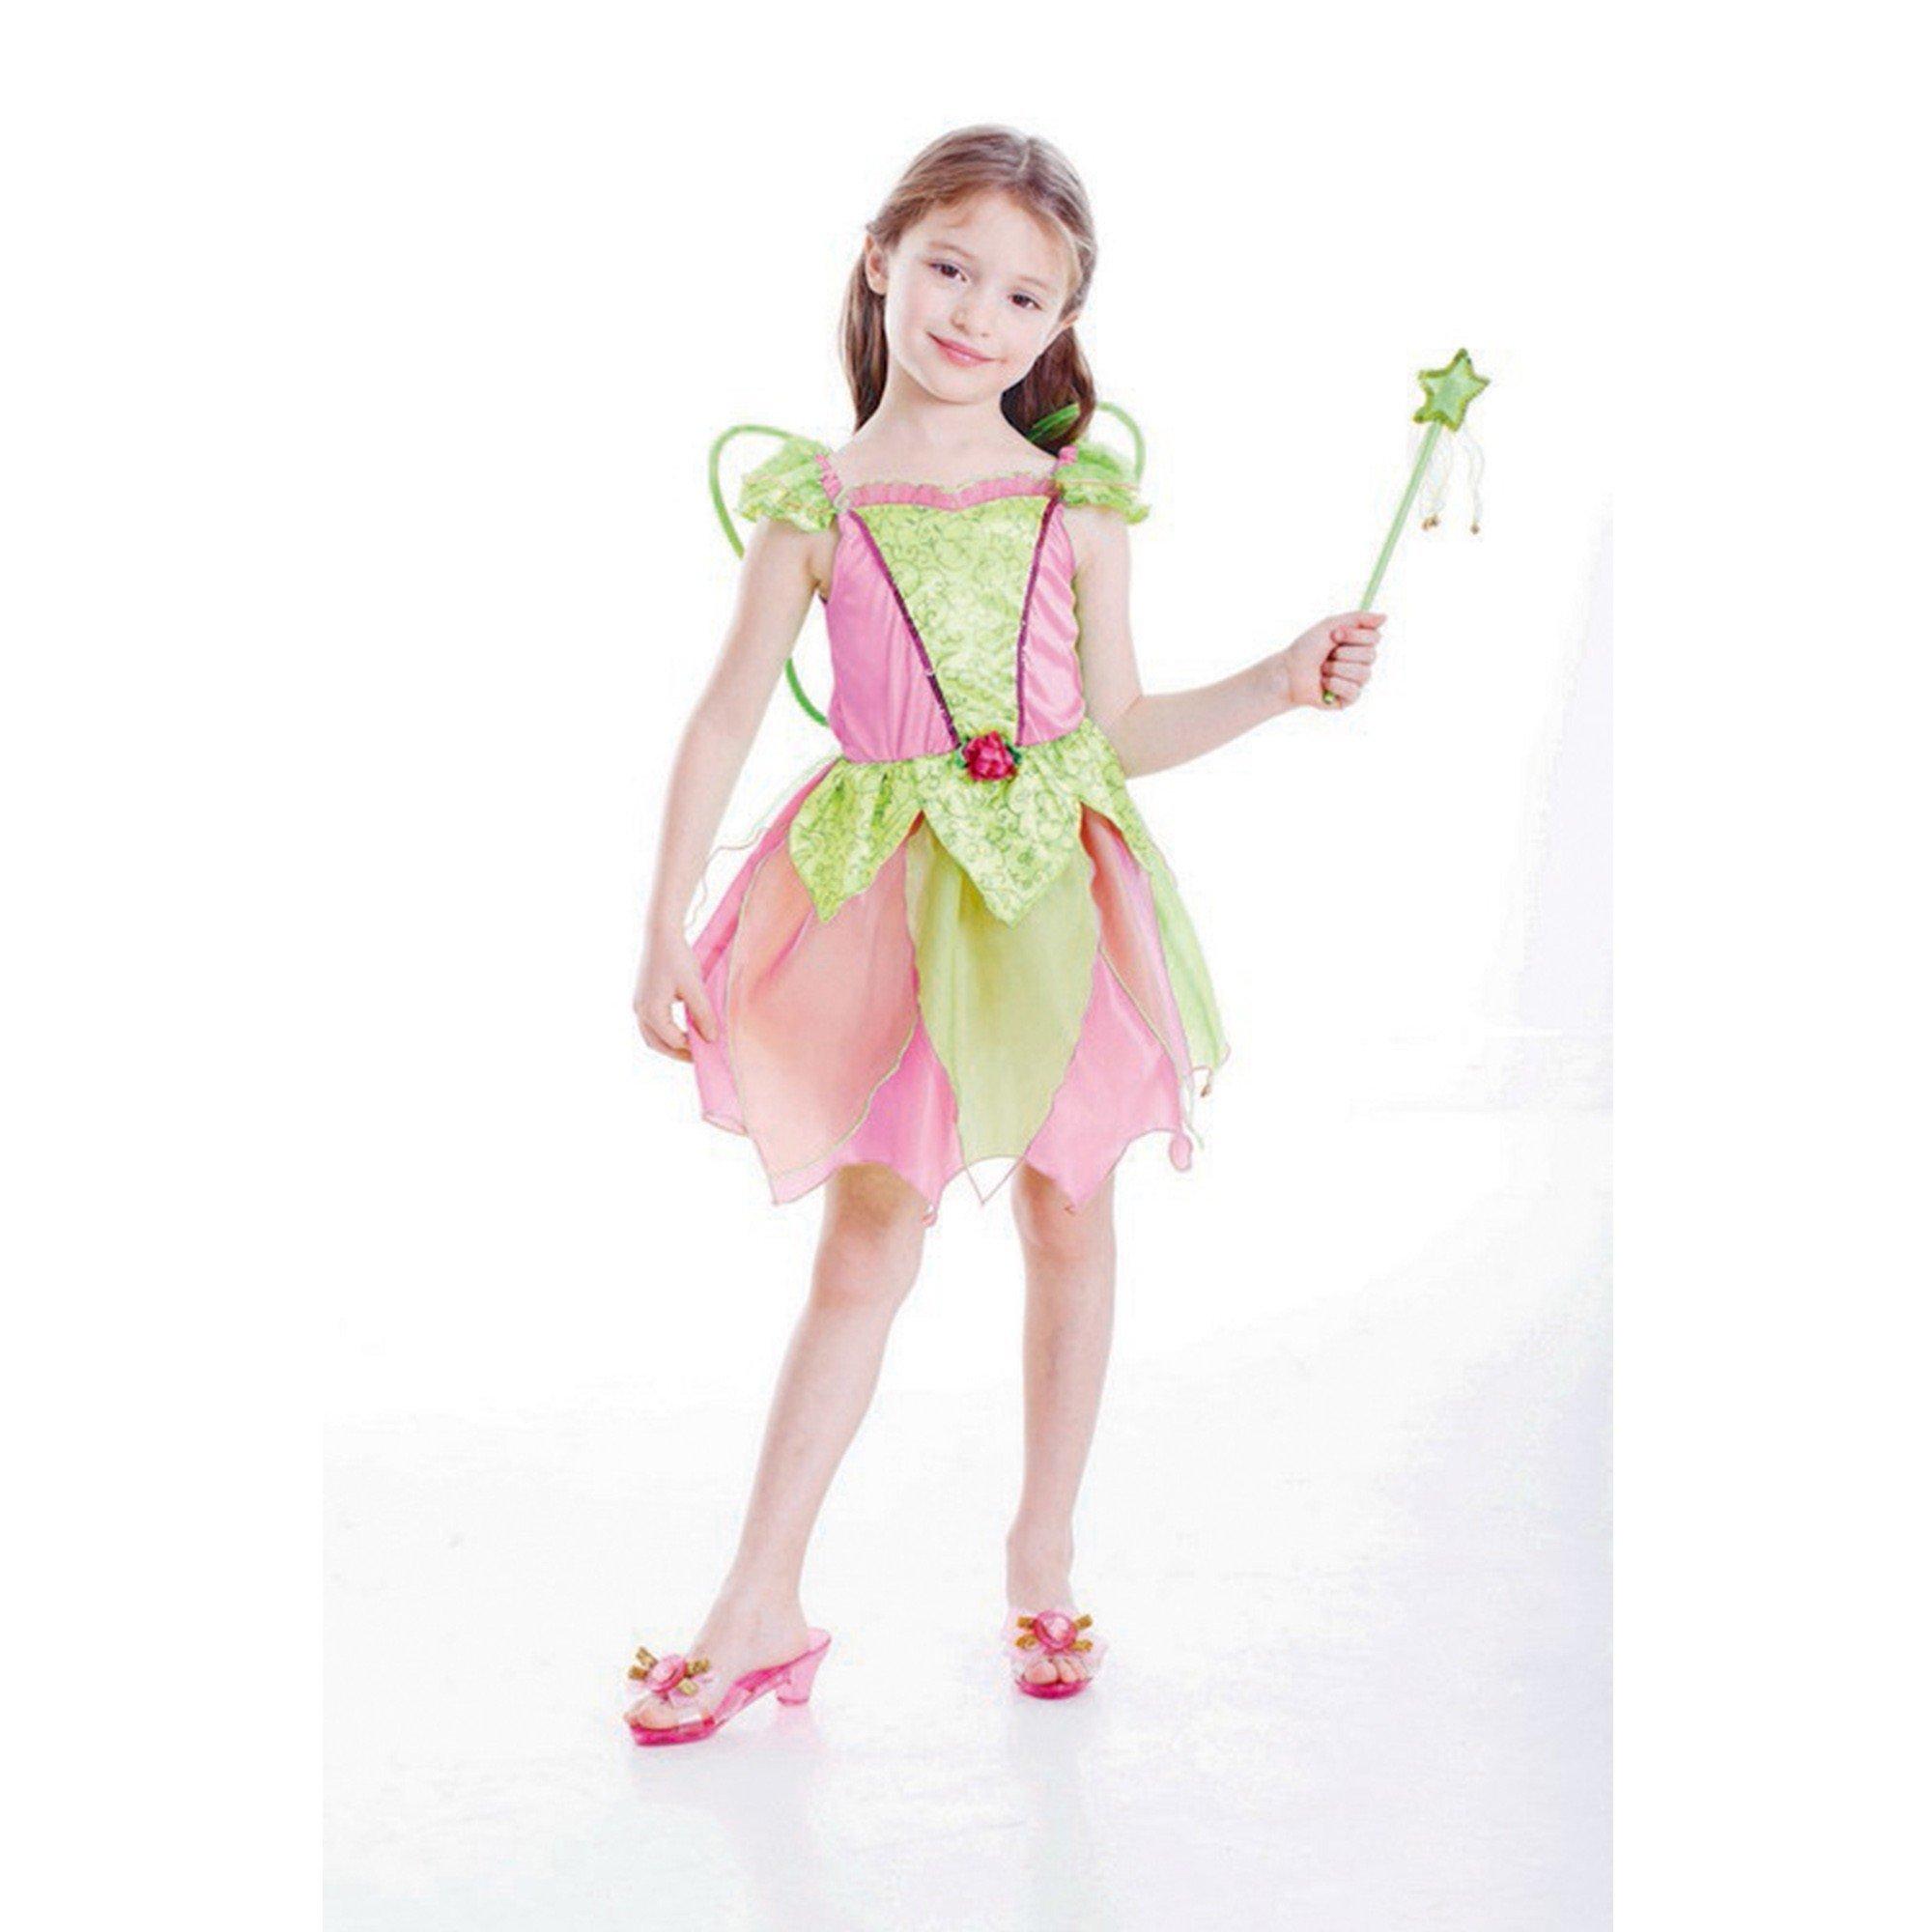 Garden Fairy Girl Costume (Large) 6-8 yrs